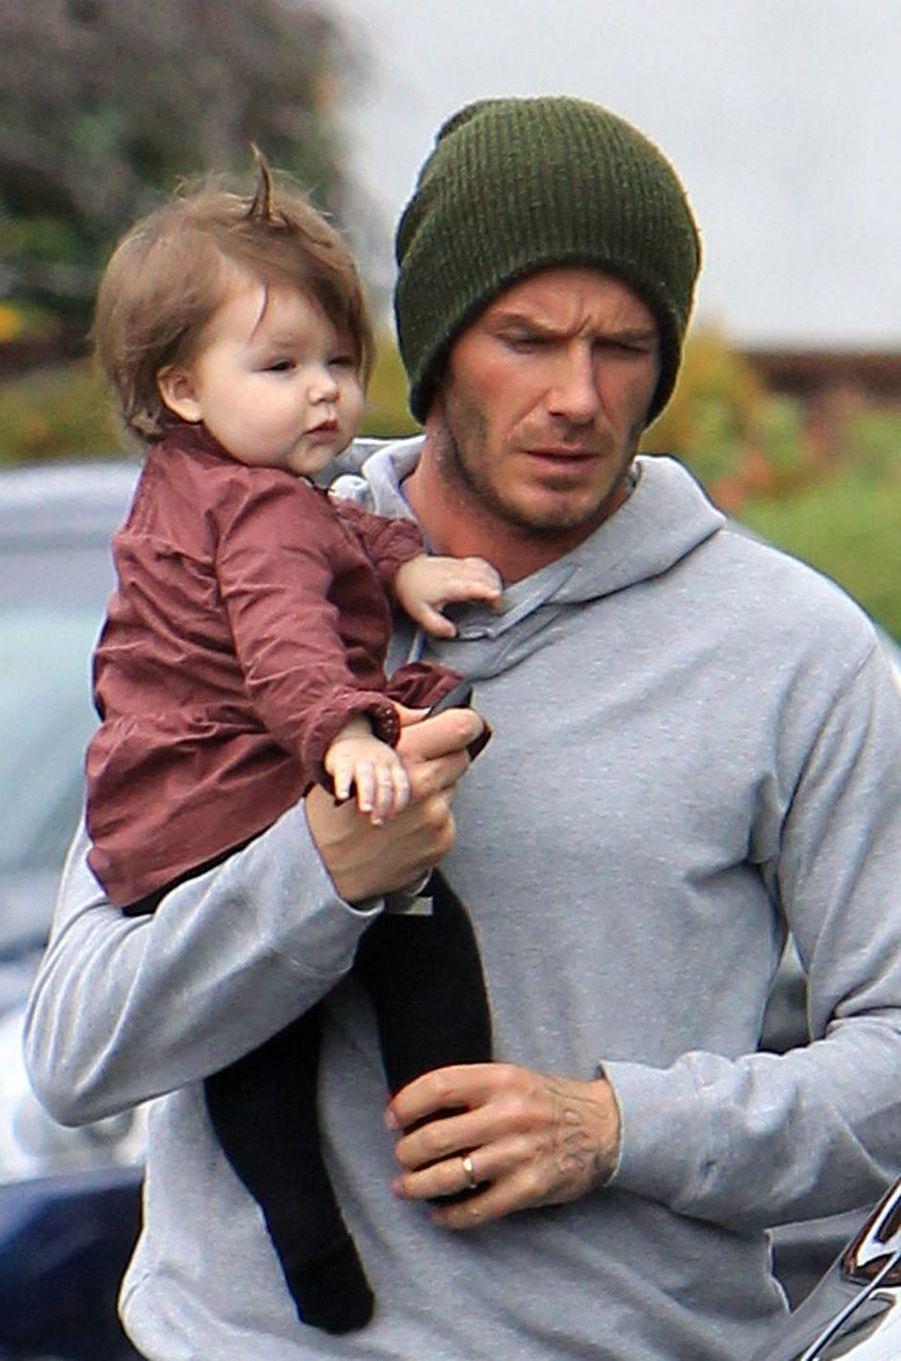 Harper Beckham avec son père David Beckham en mars 2012